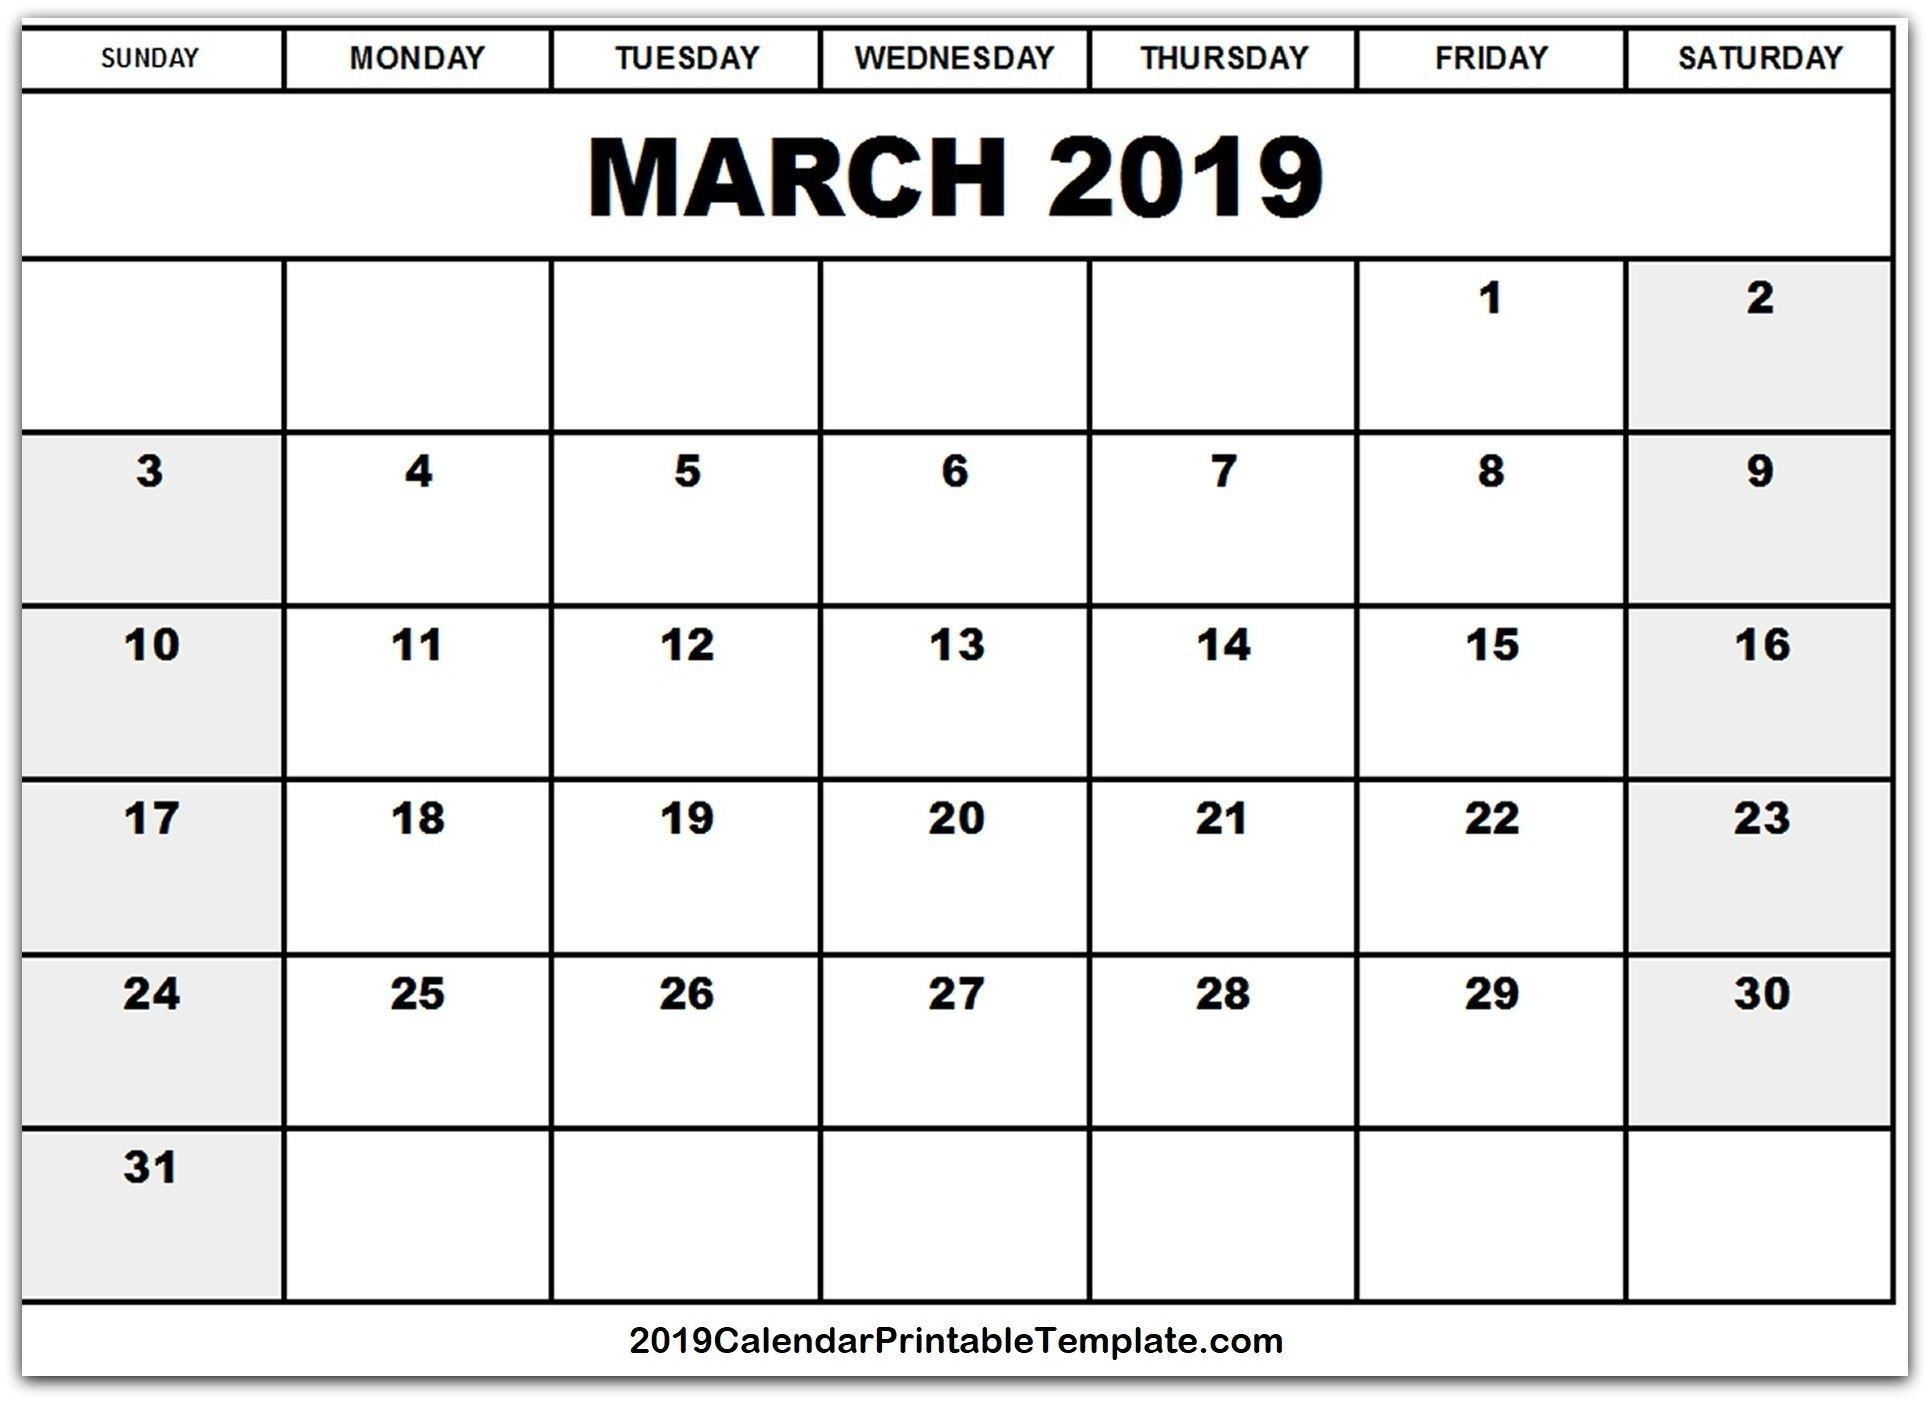 March 2019 Calendar Excel | March 2019 Calendar Printable